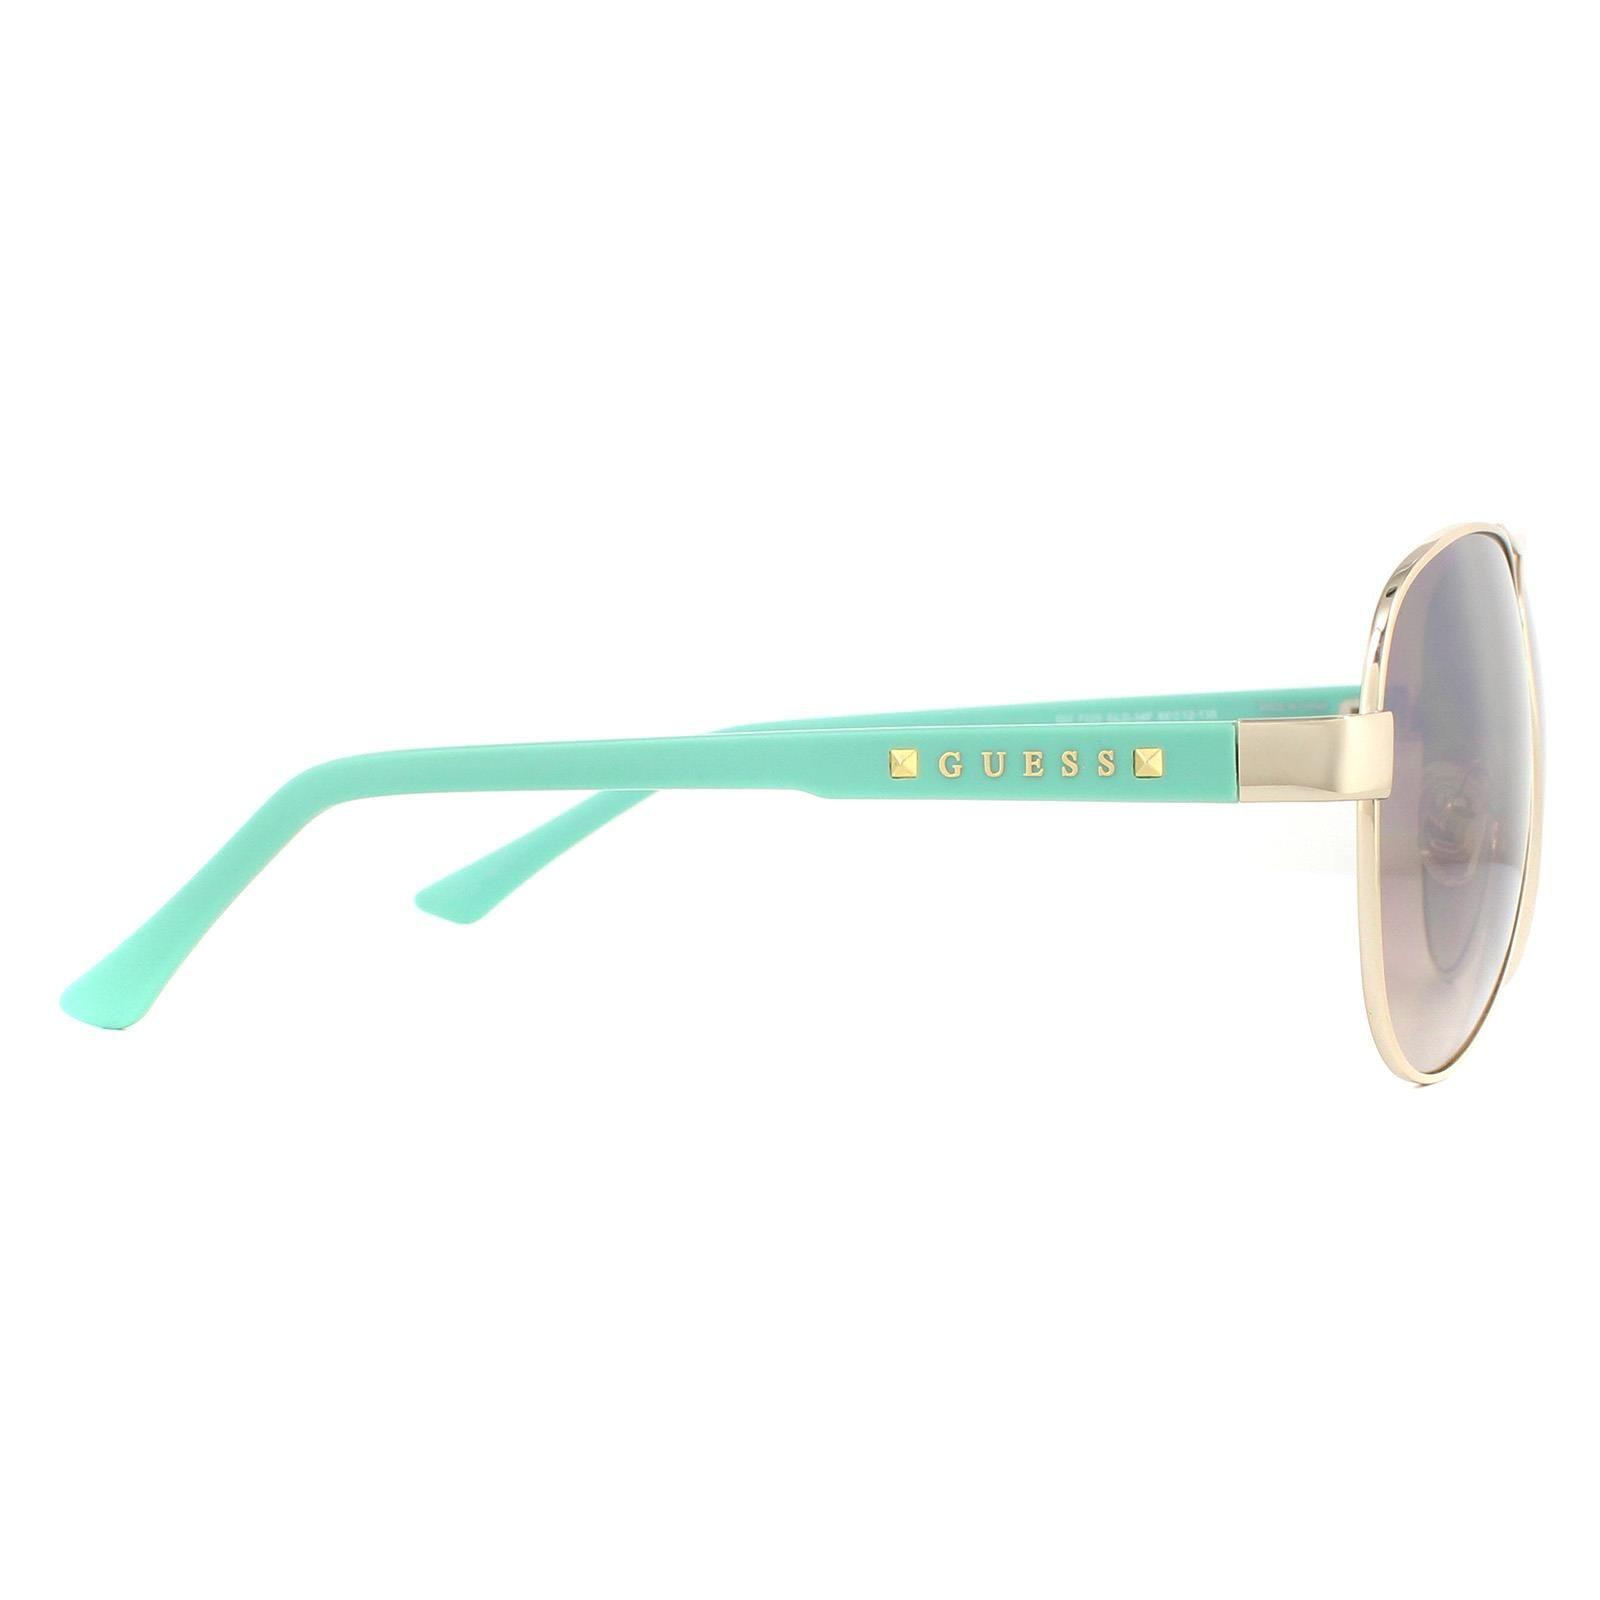 Guess Sunglasses GU7325 GLD-34F Gold Aqua Brown Gradient